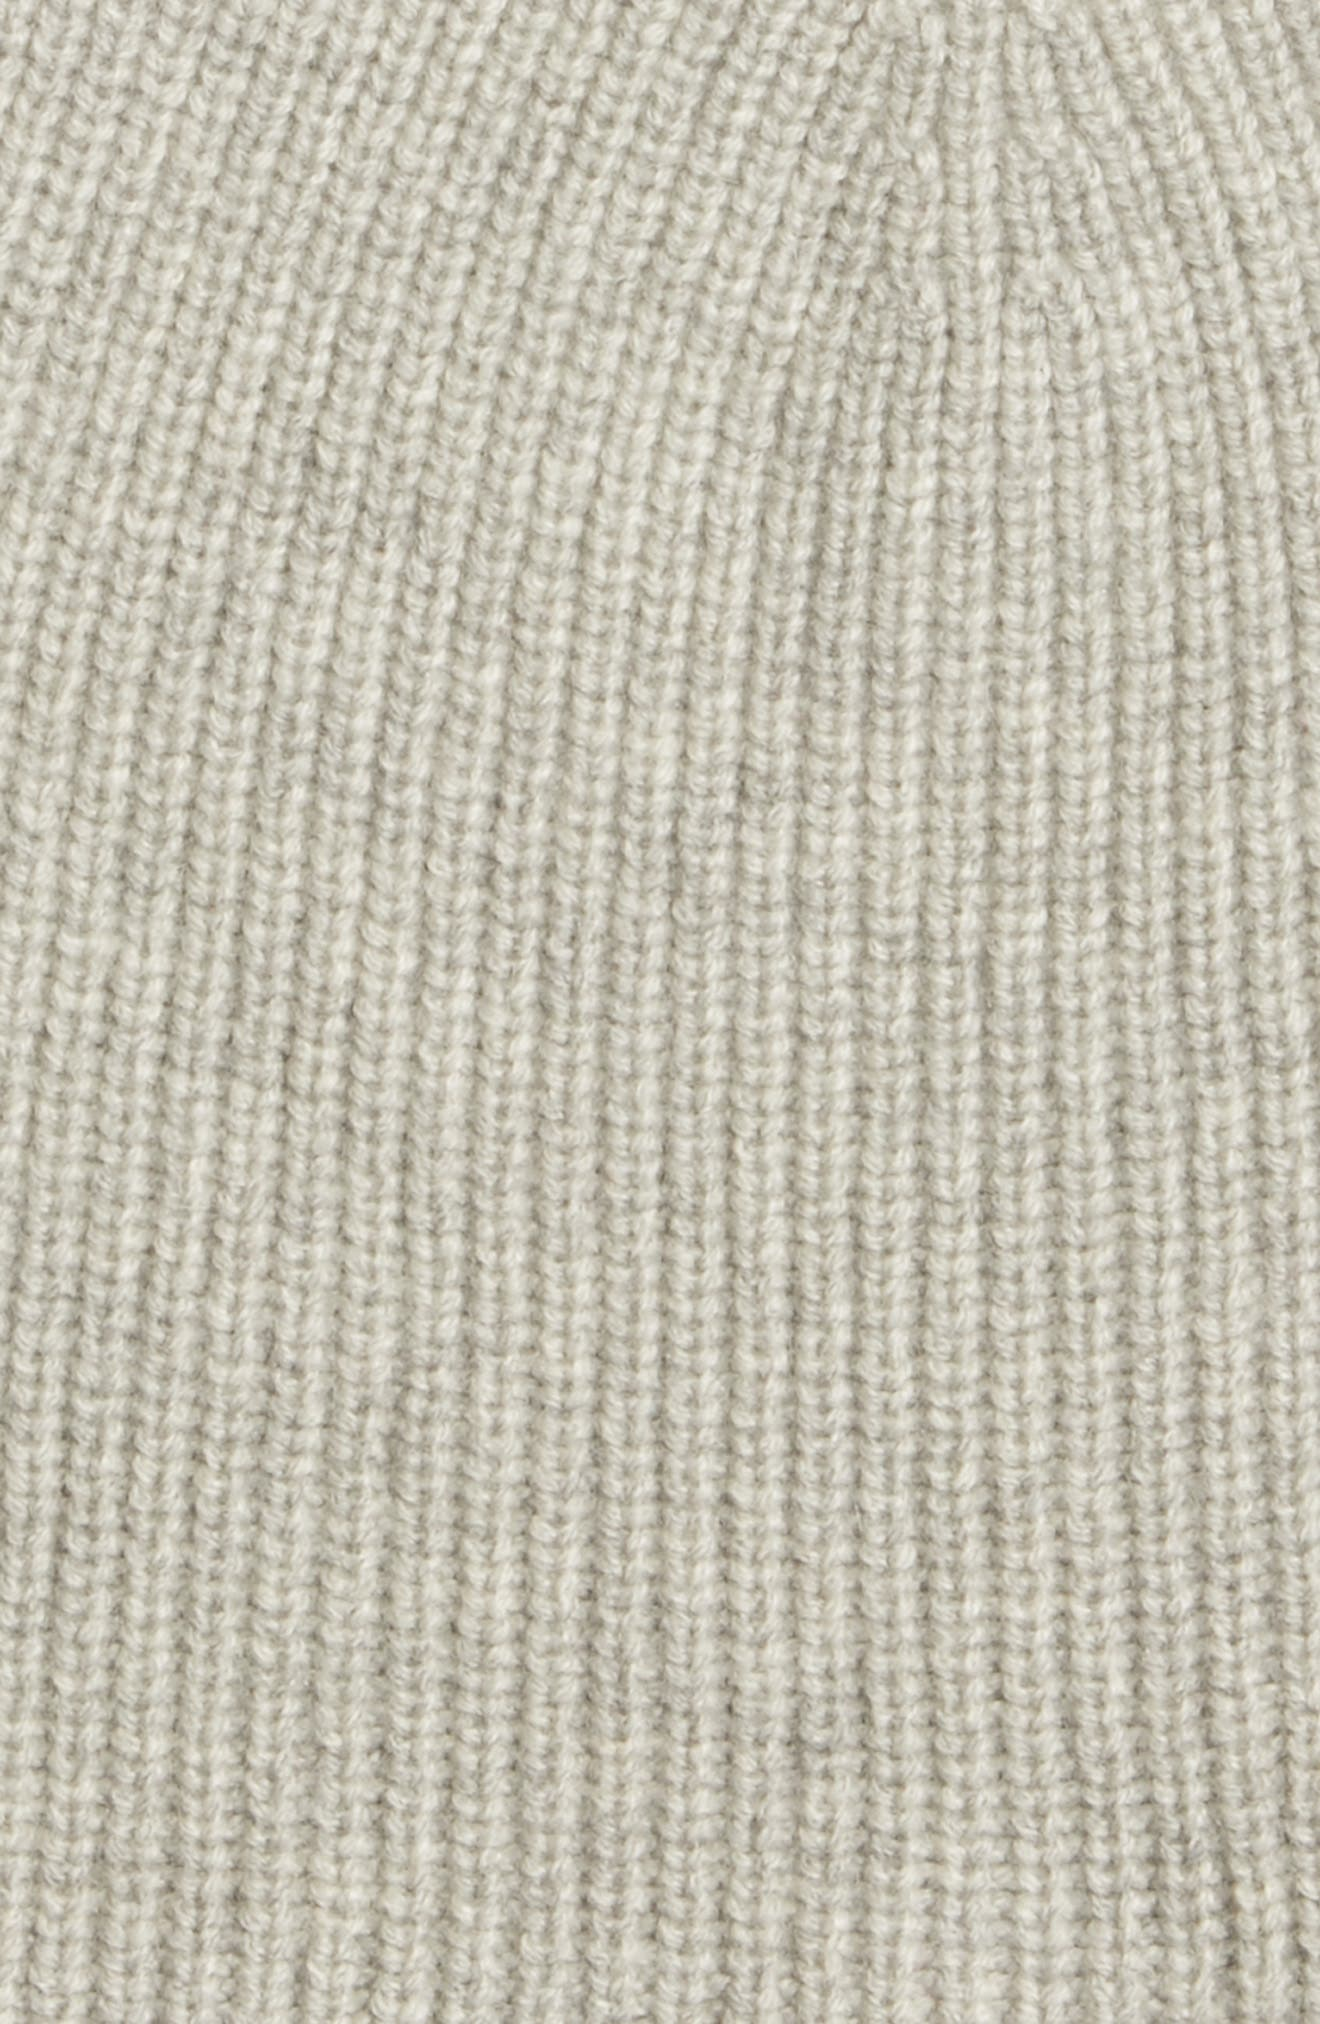 EILEEN FISHER,                             Cashmere Blend Beanie,                             Alternate thumbnail 2, color,                             020